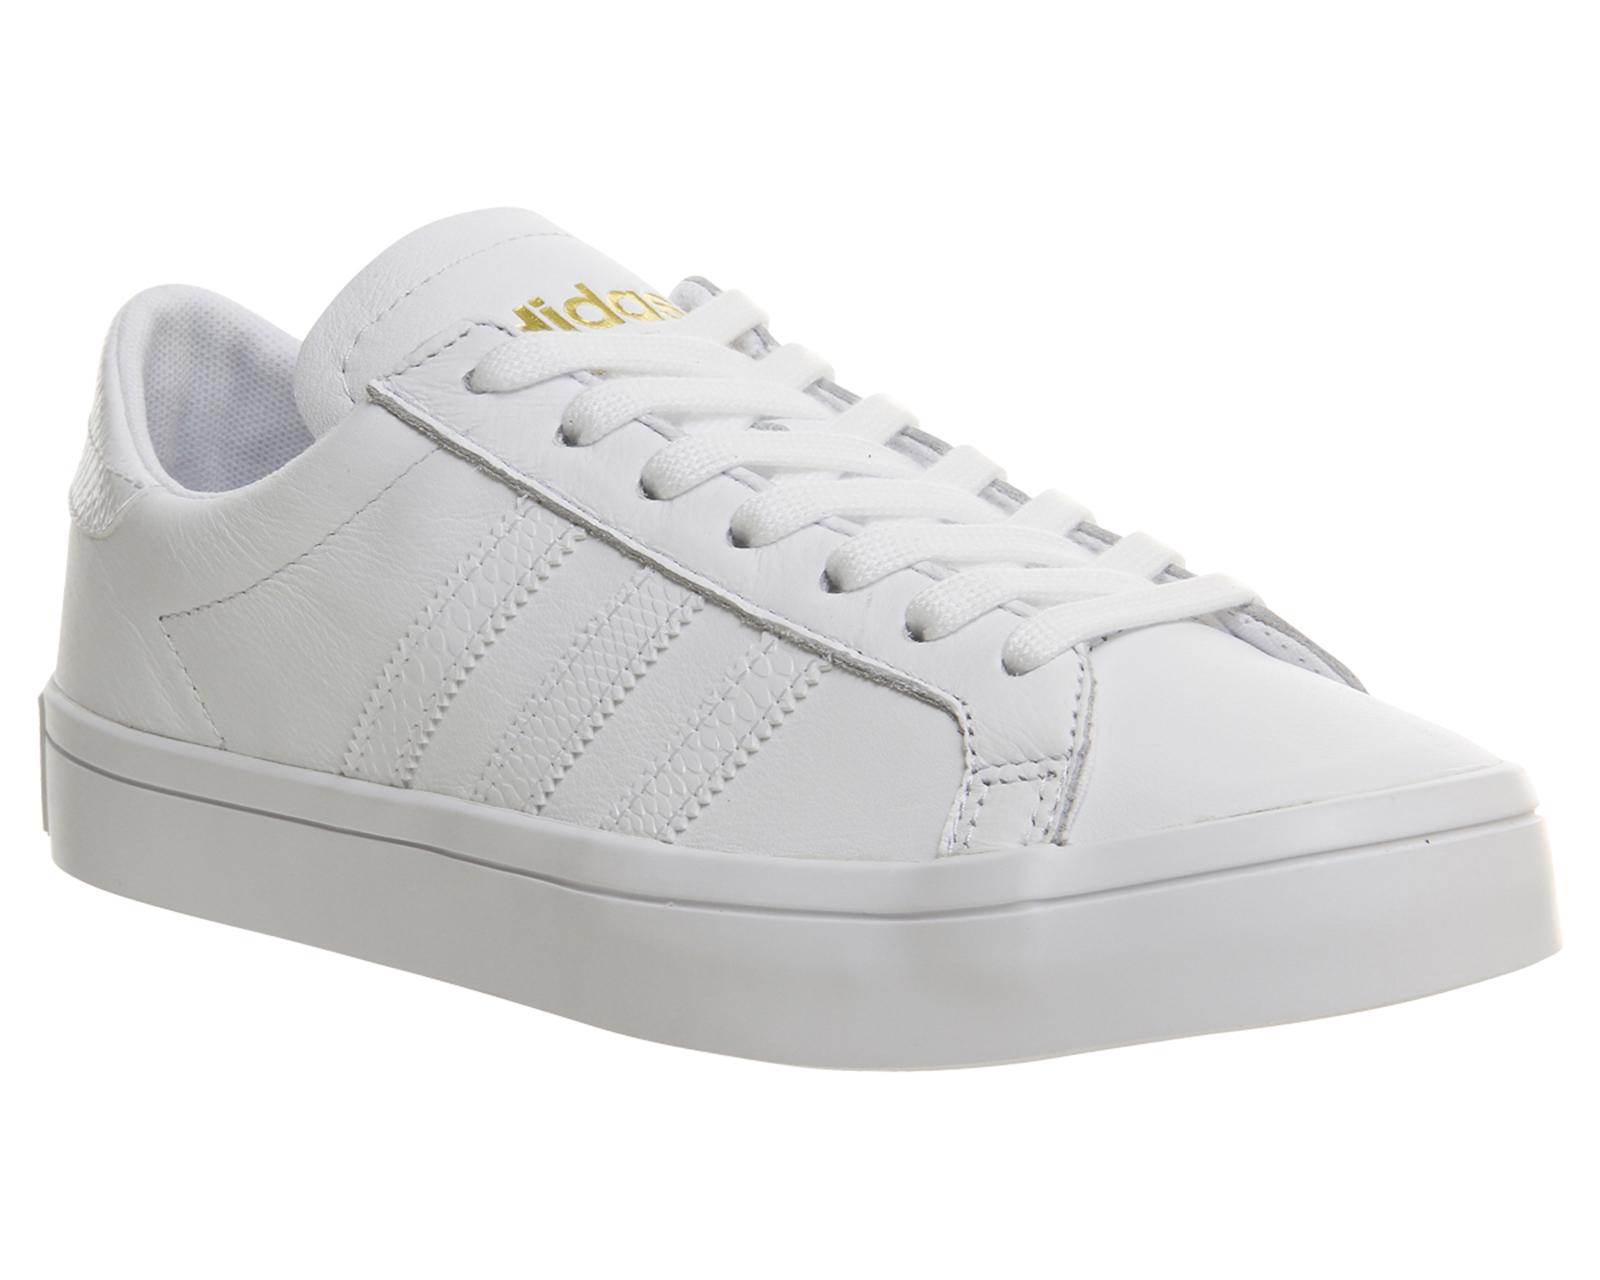 adidas court vantage sneakers